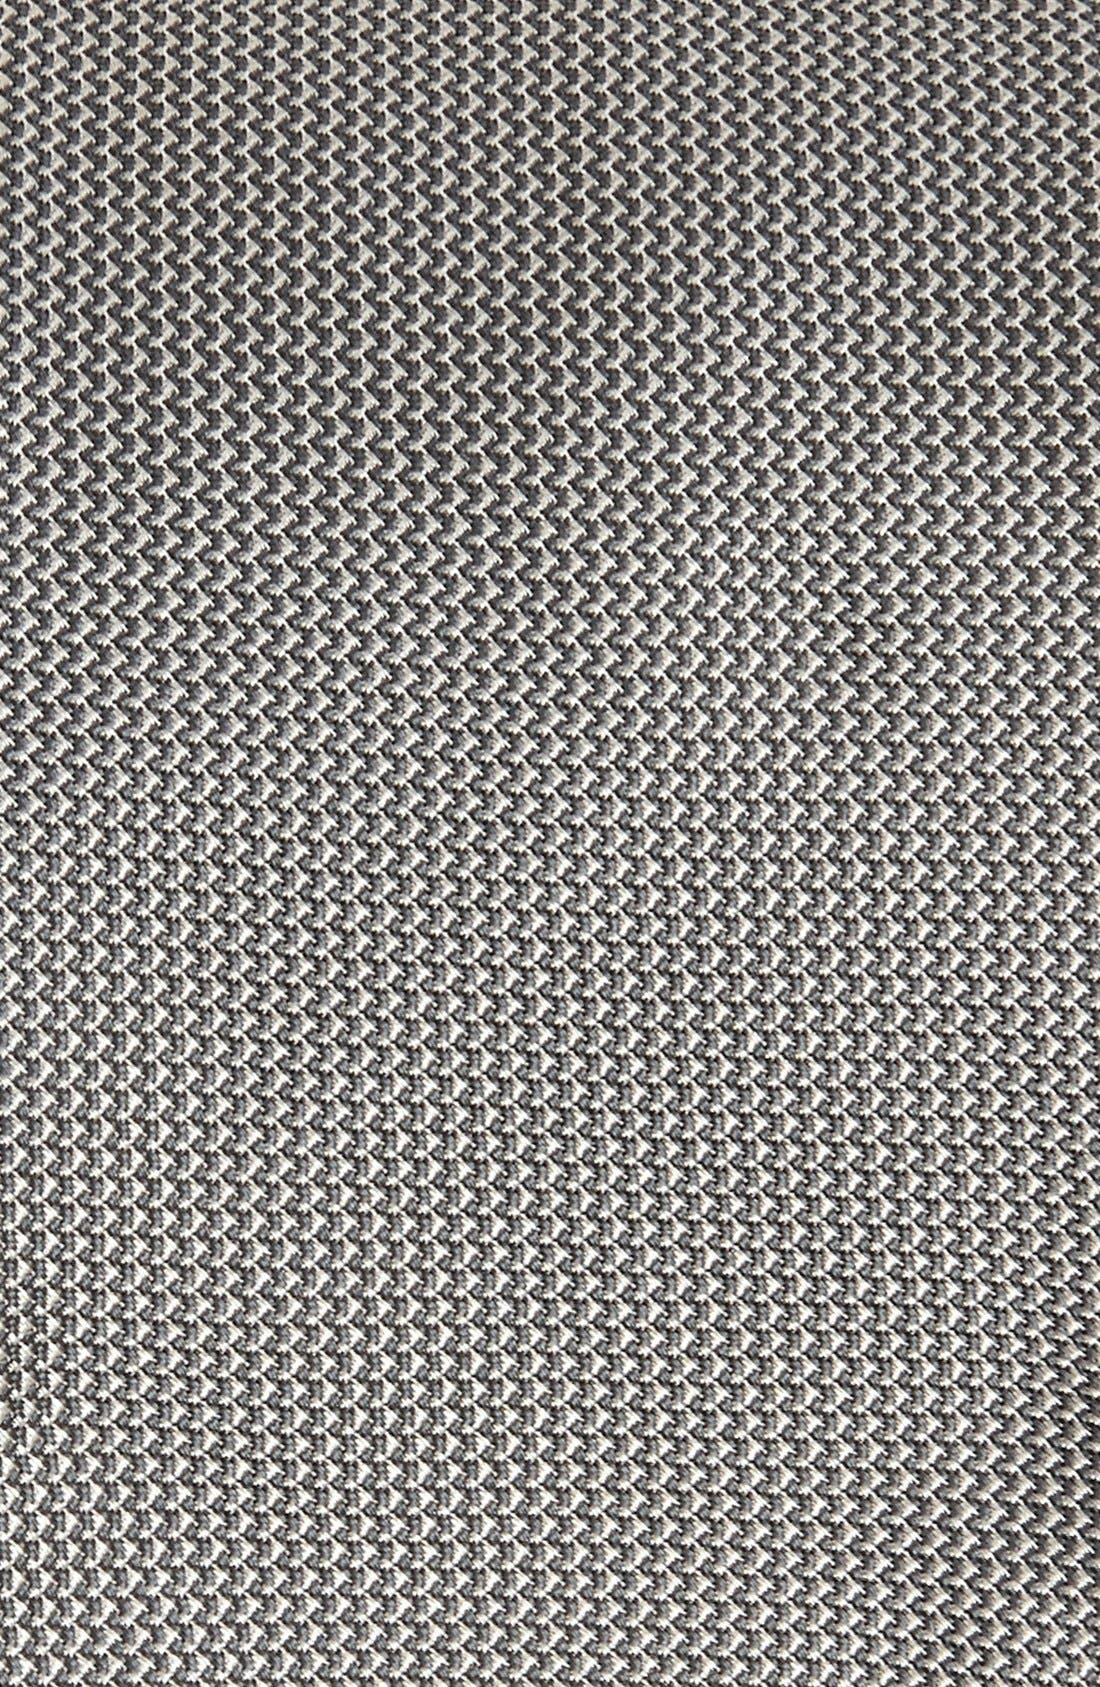 Alternate Image 2  - John W. Nordstrom® Woven Silk Tie (Tall)